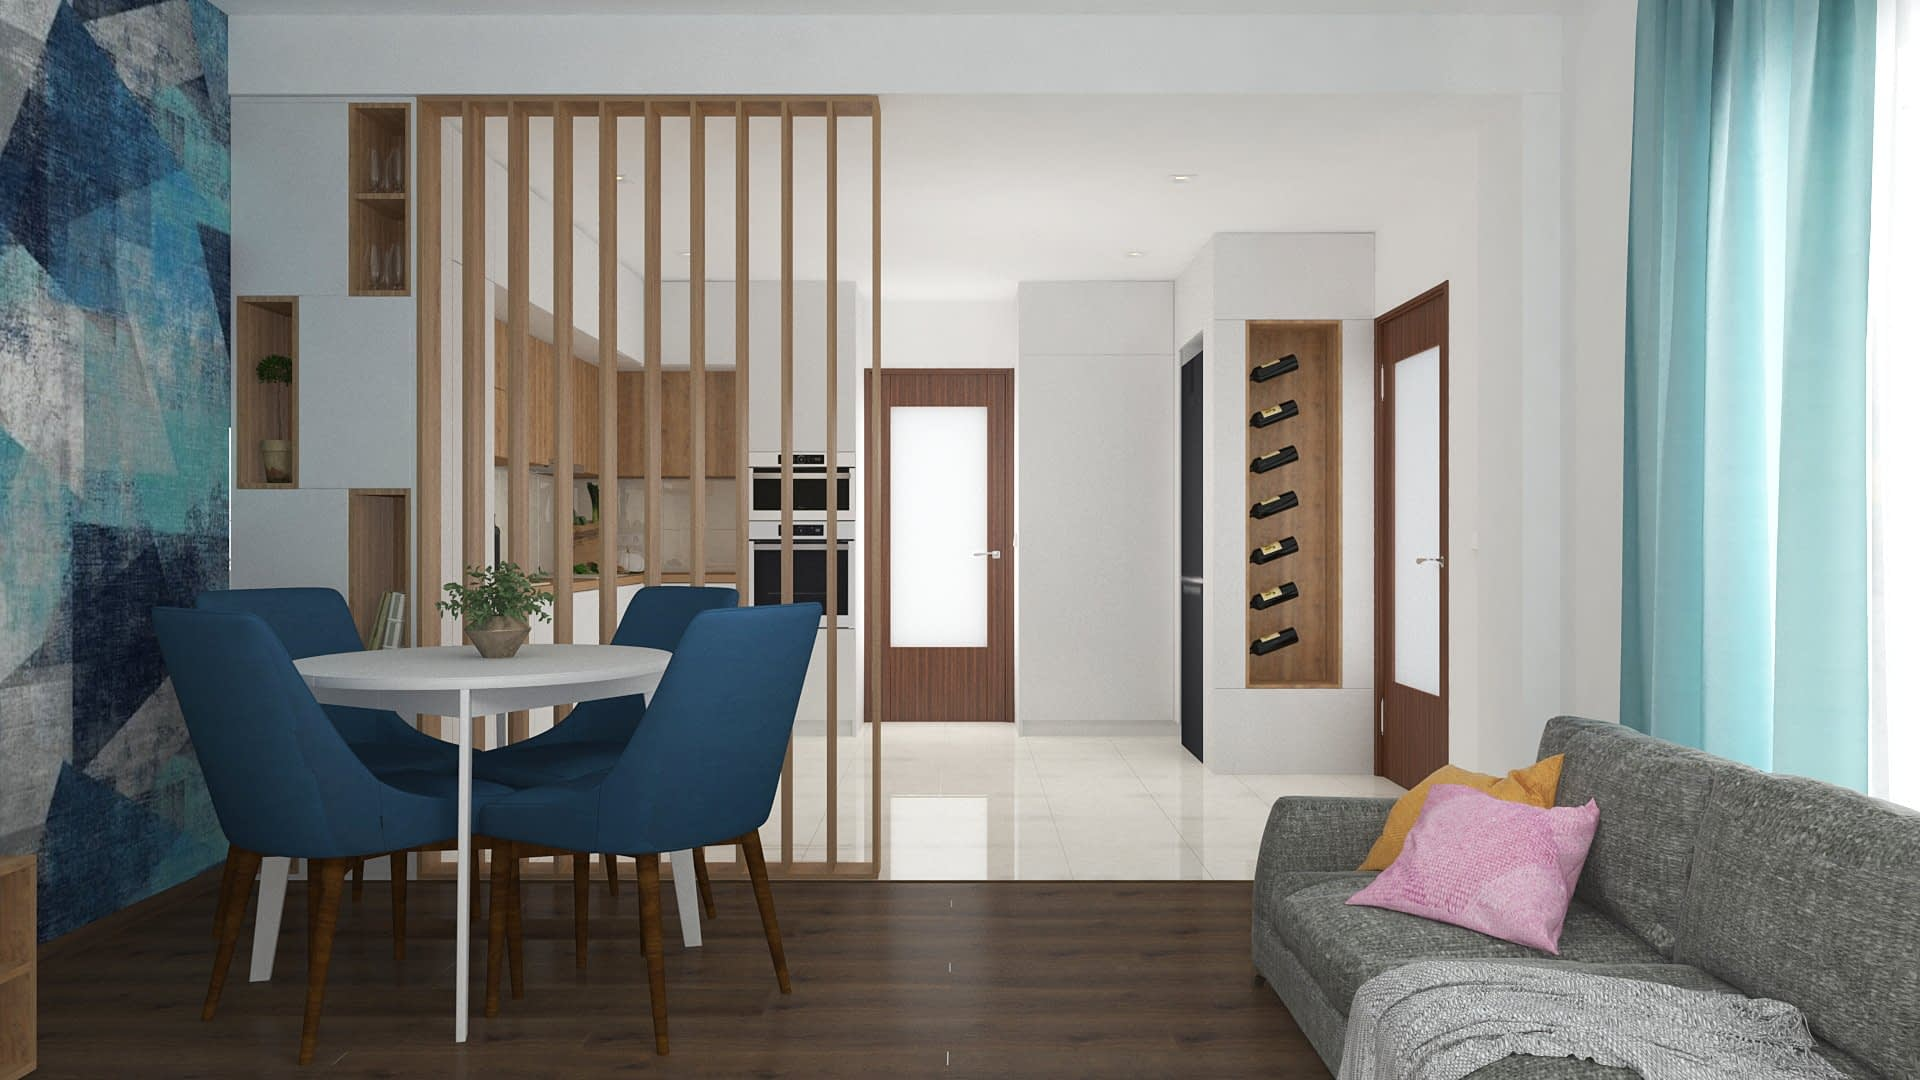 Denim | Kitchen & Living Design 02